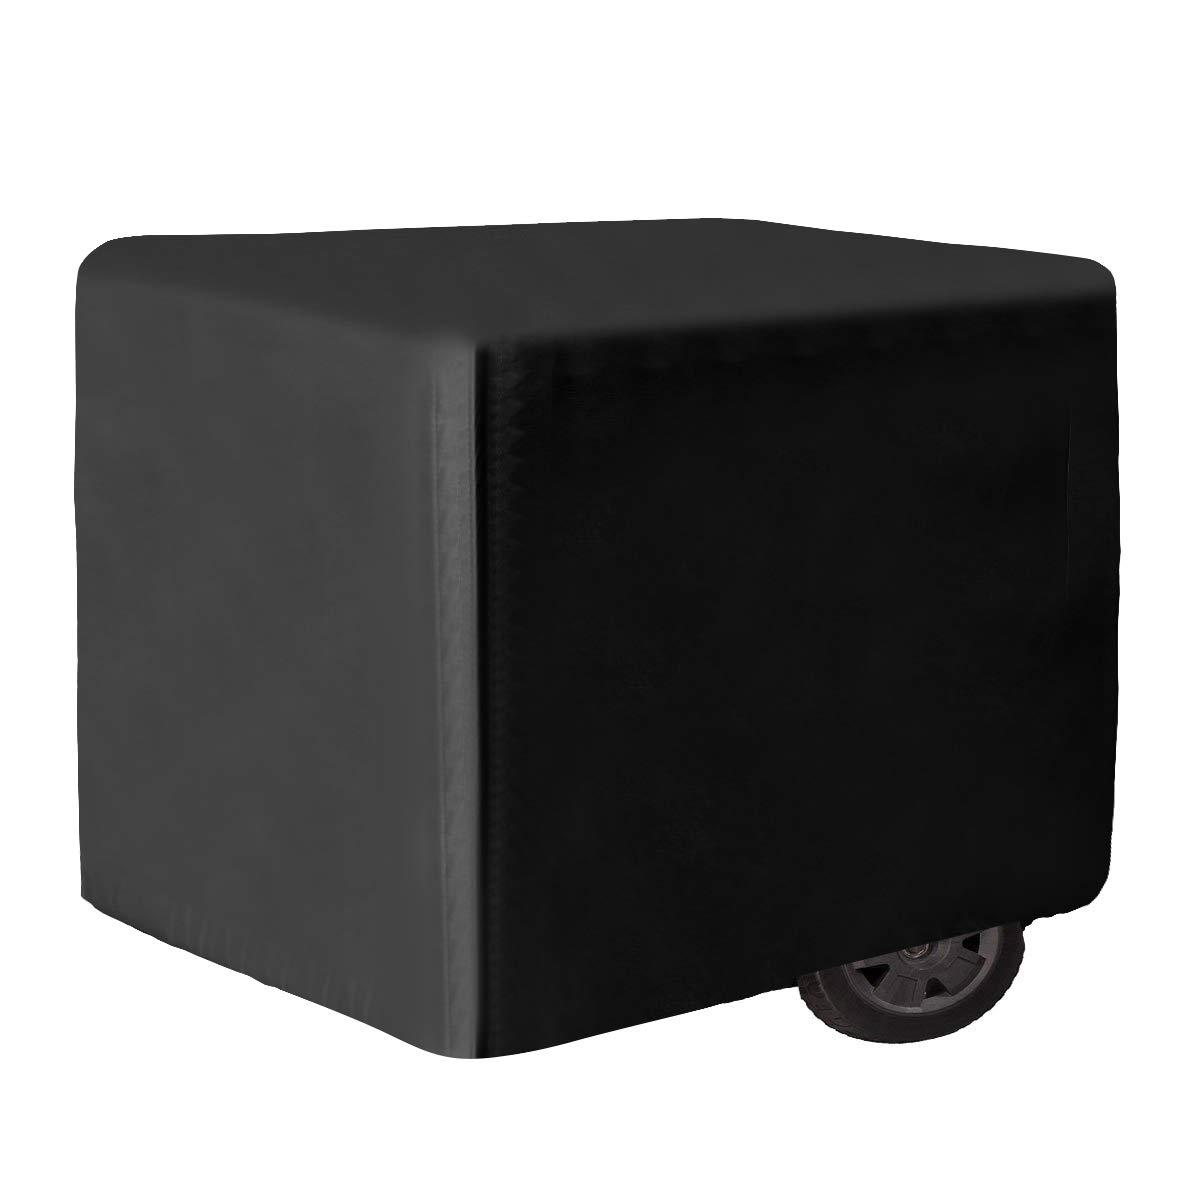 iiSPORT Waterproof Generator Cover - 600D Heavy Duty Polyester Generator Cover Large, Fits Generators Up to 38'' L x 28'' W x 30'' H, Black by iiSPORT